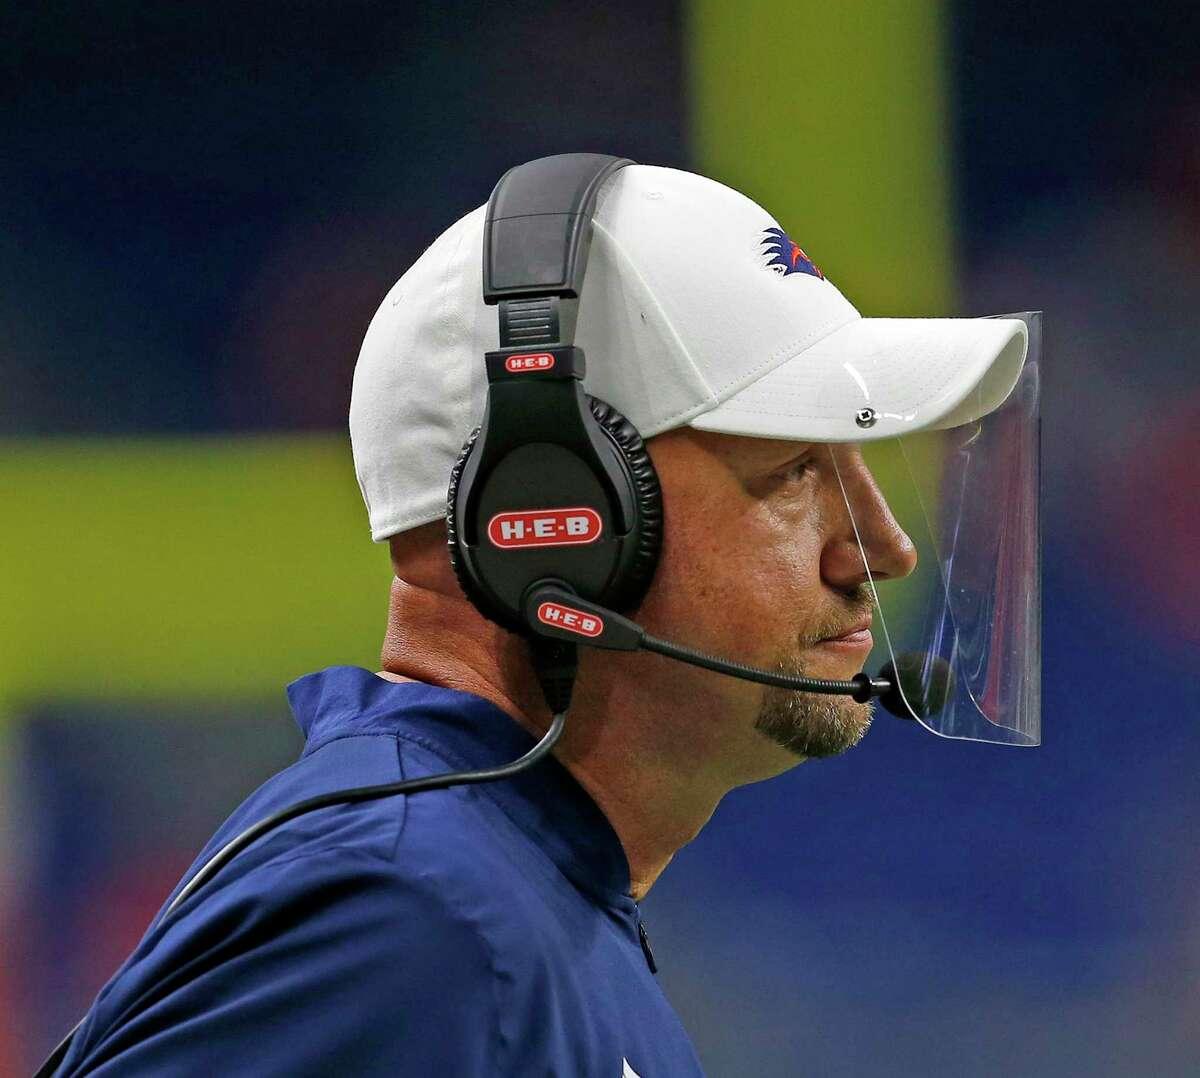 UTSA head coach Jeff Traylor reacts after a Louisiana Tech touchdown. UTSA Louisiana Tech on October 24, 2020 at the Alamodome. Halftime score UTSA 6 Louisiana Tech 19